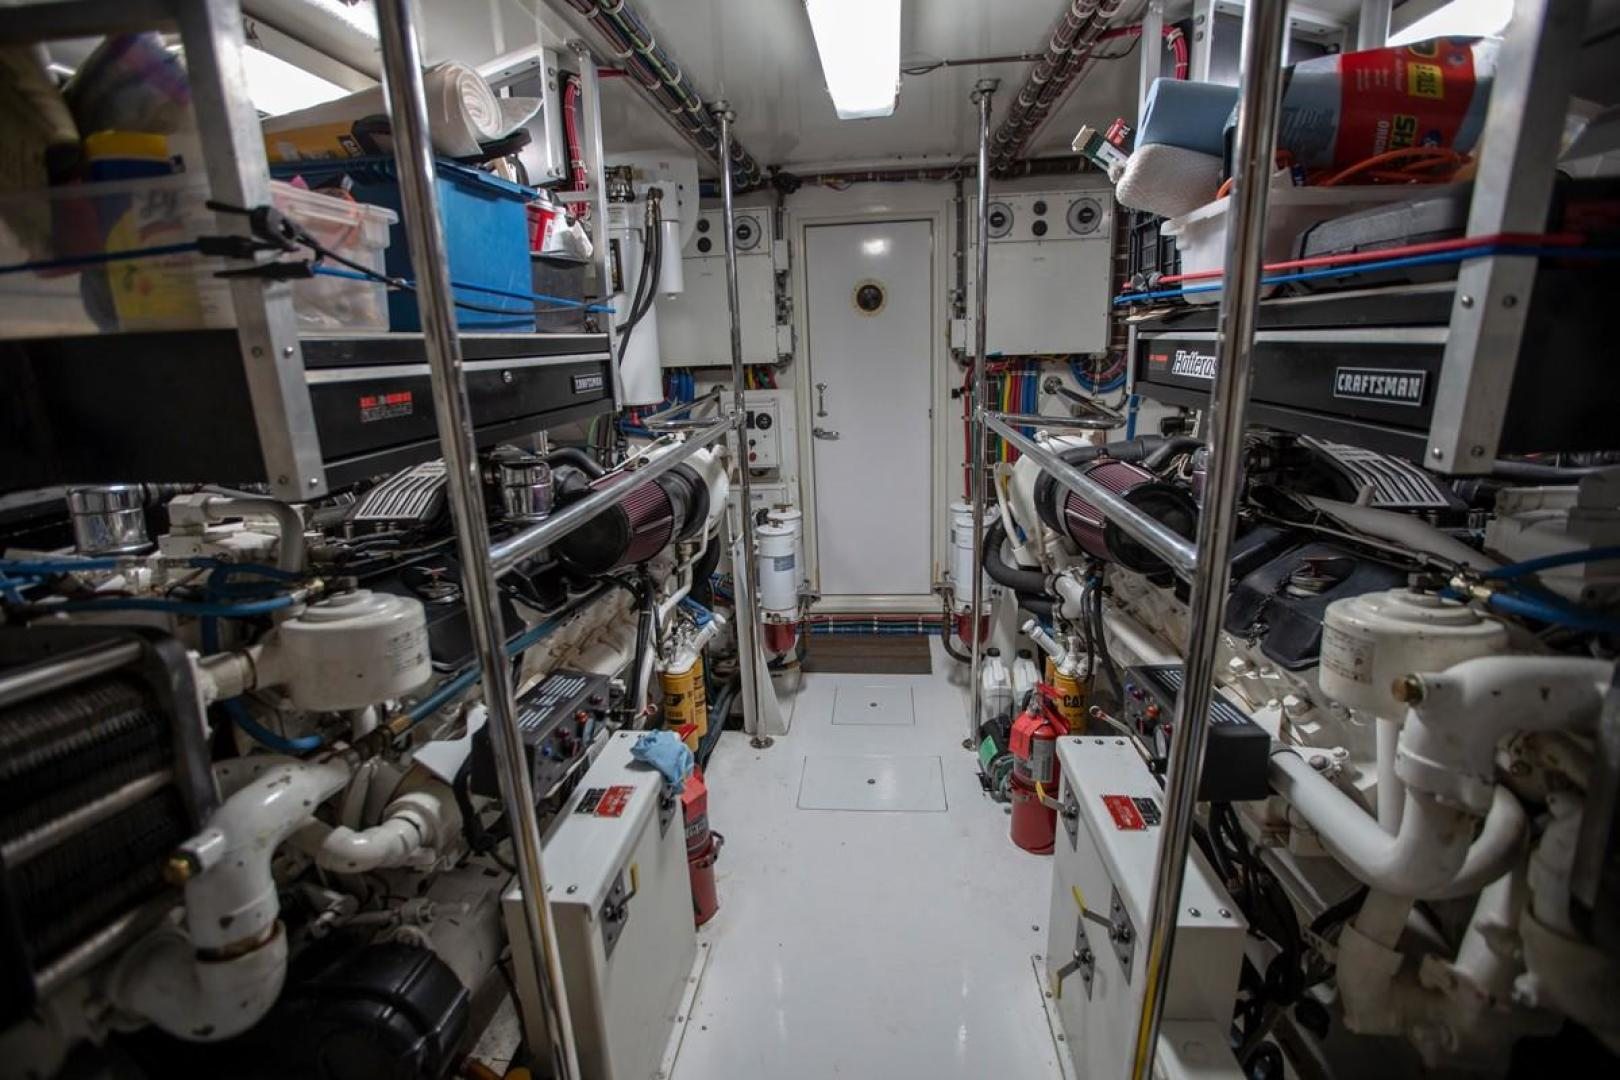 Hatteras-Cockpit Motor Yacht 2000-Getaway Ft. Lauderdale-Florida-United States-977380 | Thumbnail